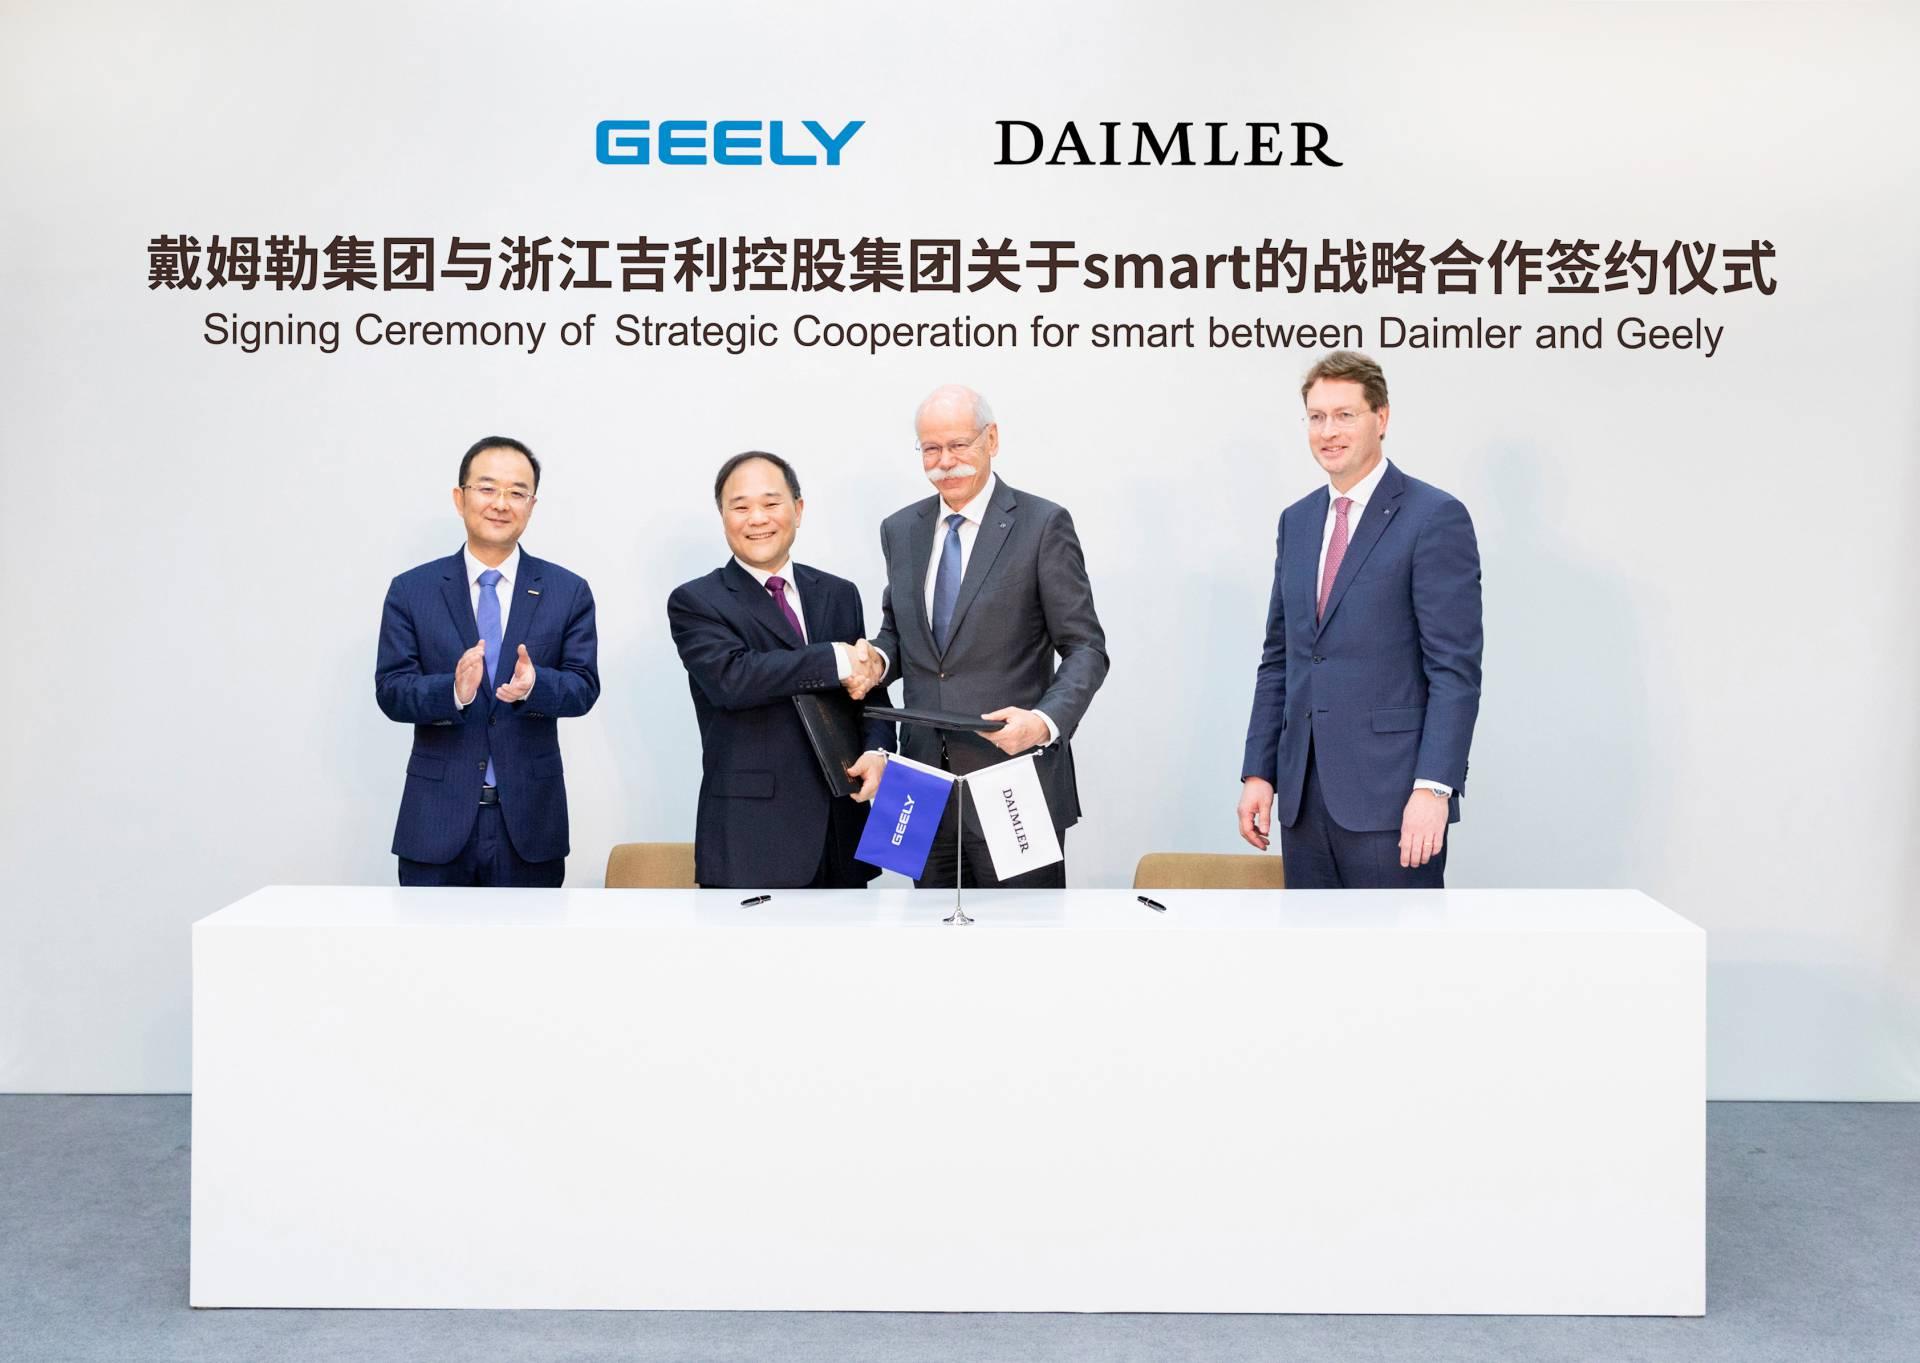 Smart - Daimler i Geely